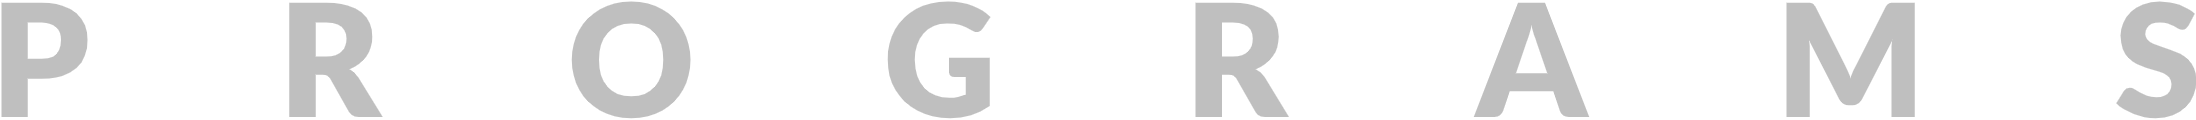 programms-text